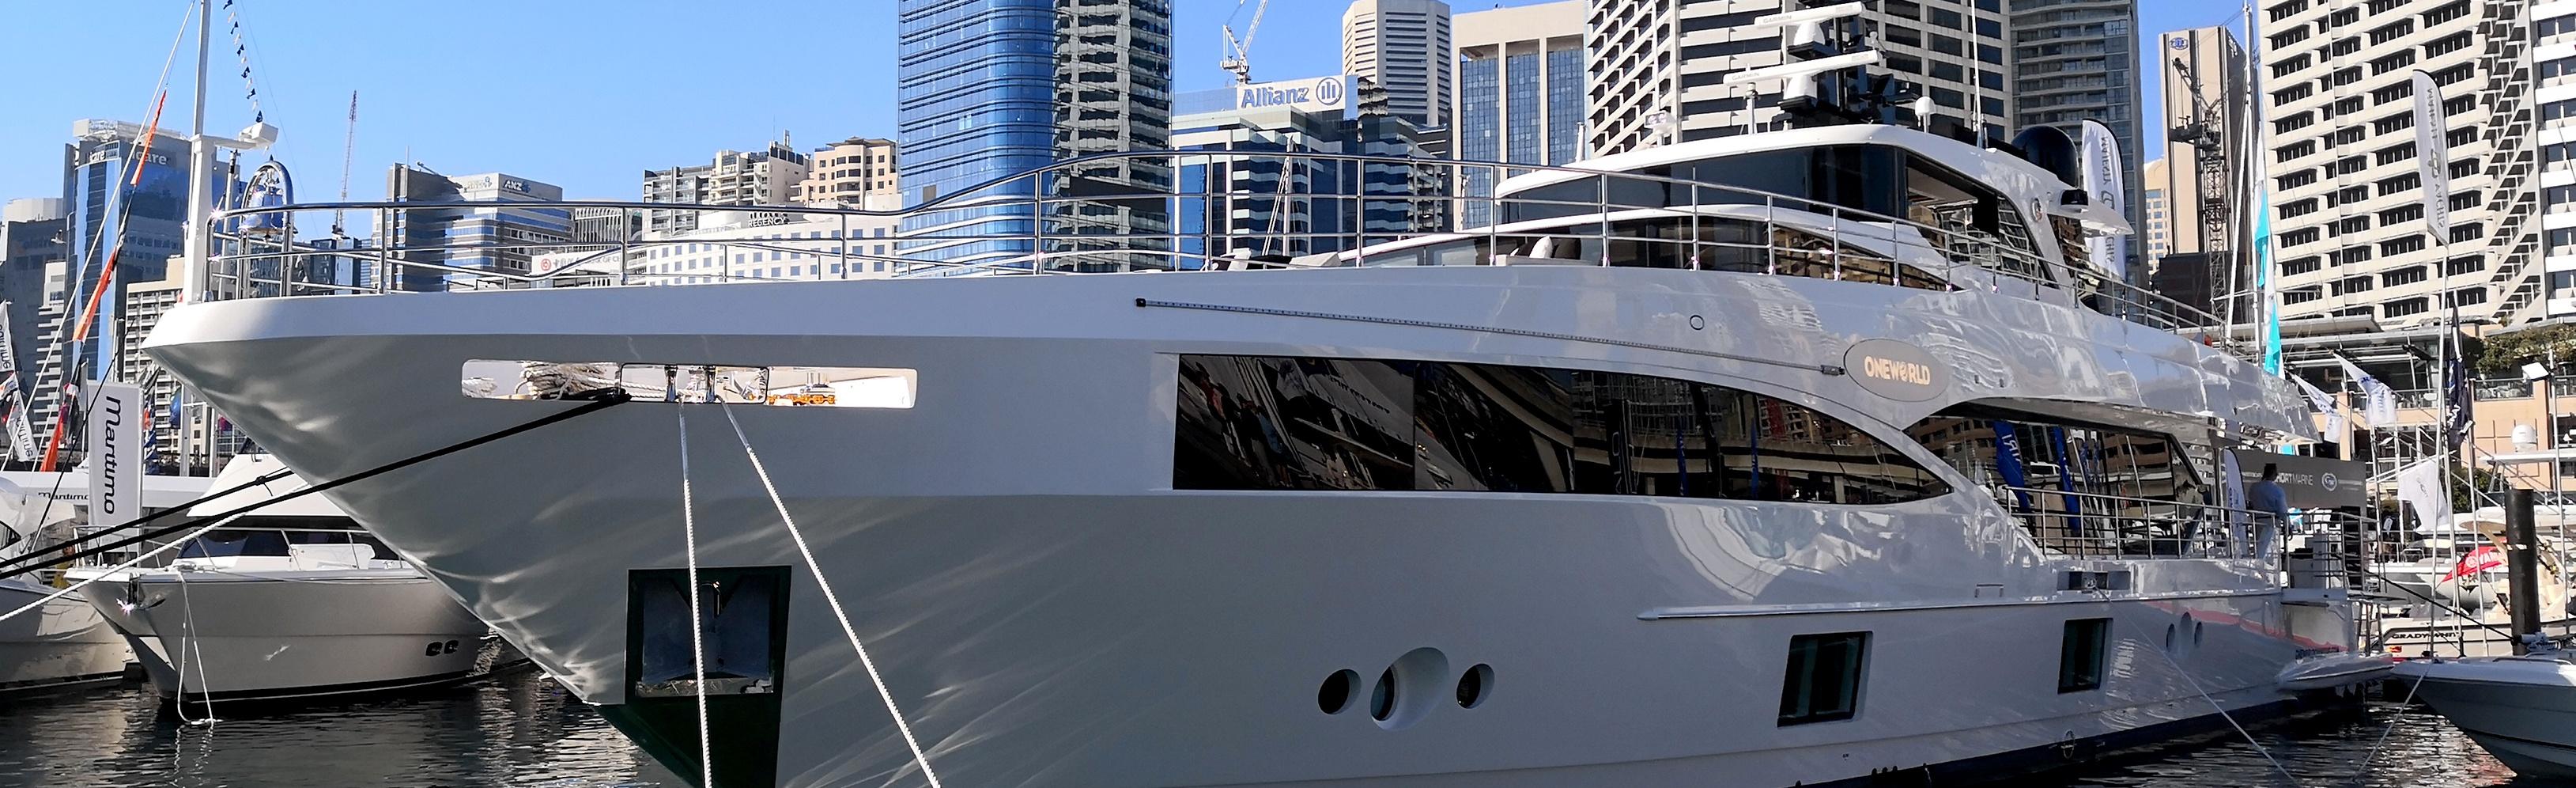 Majesty-100,-Sydney-Boat-Show-2018